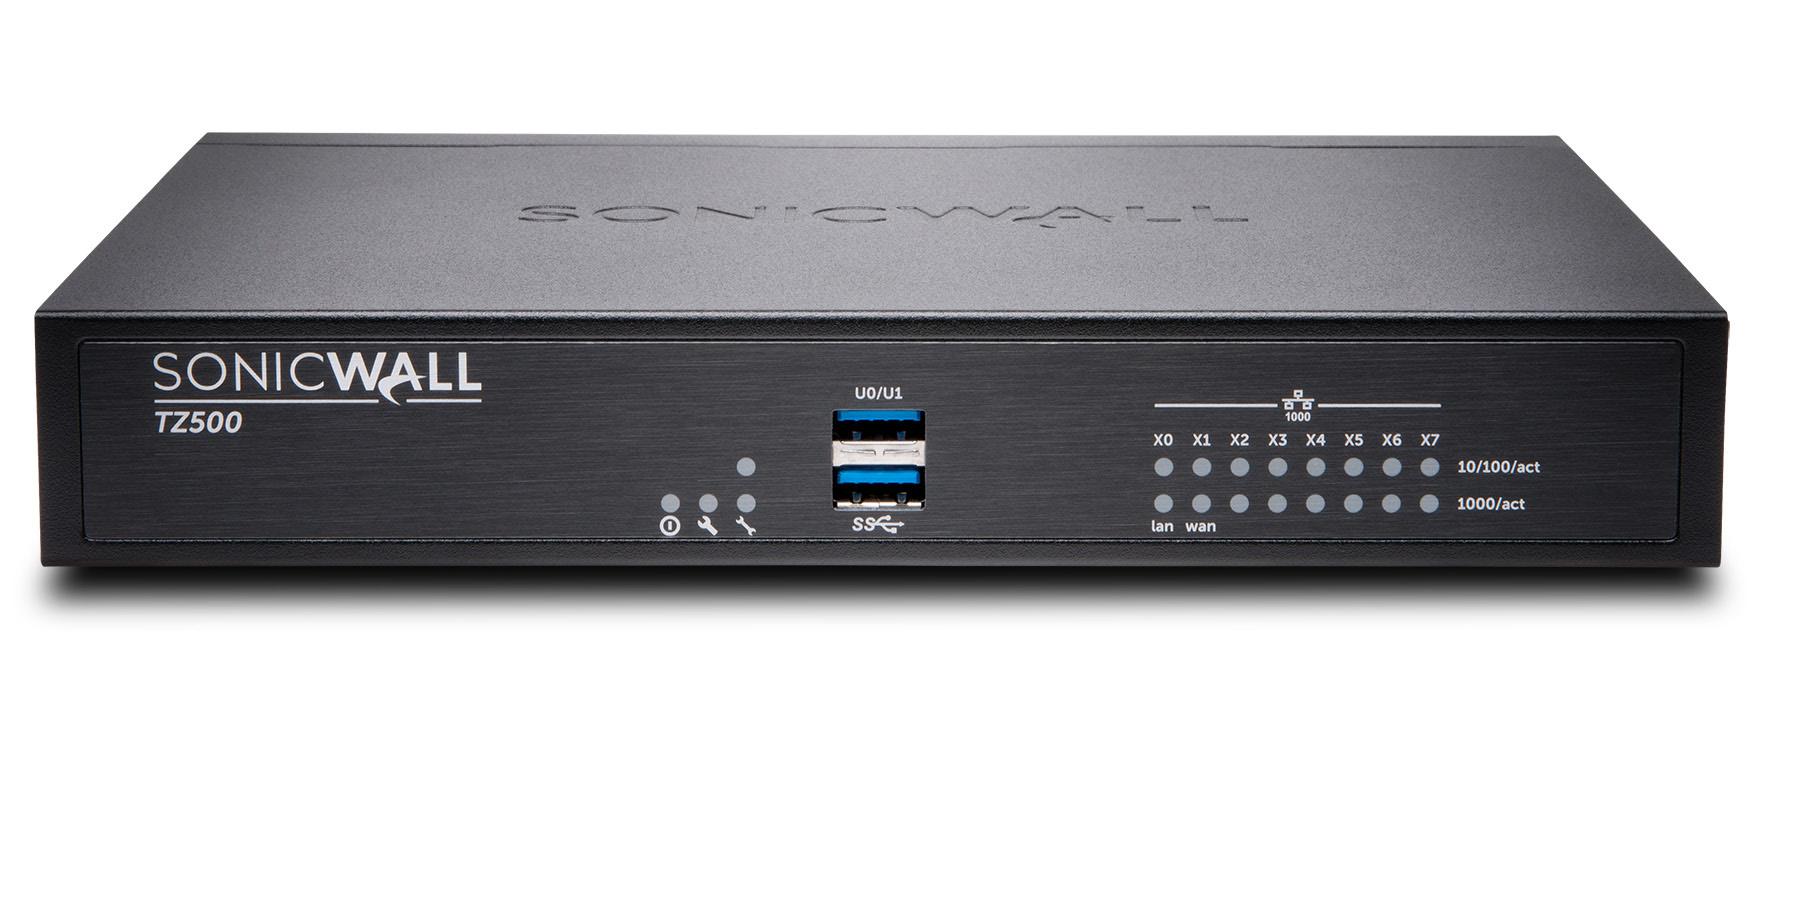 SonicWall TZ500 cortafuegos (hardware) 1400 Mbit/s